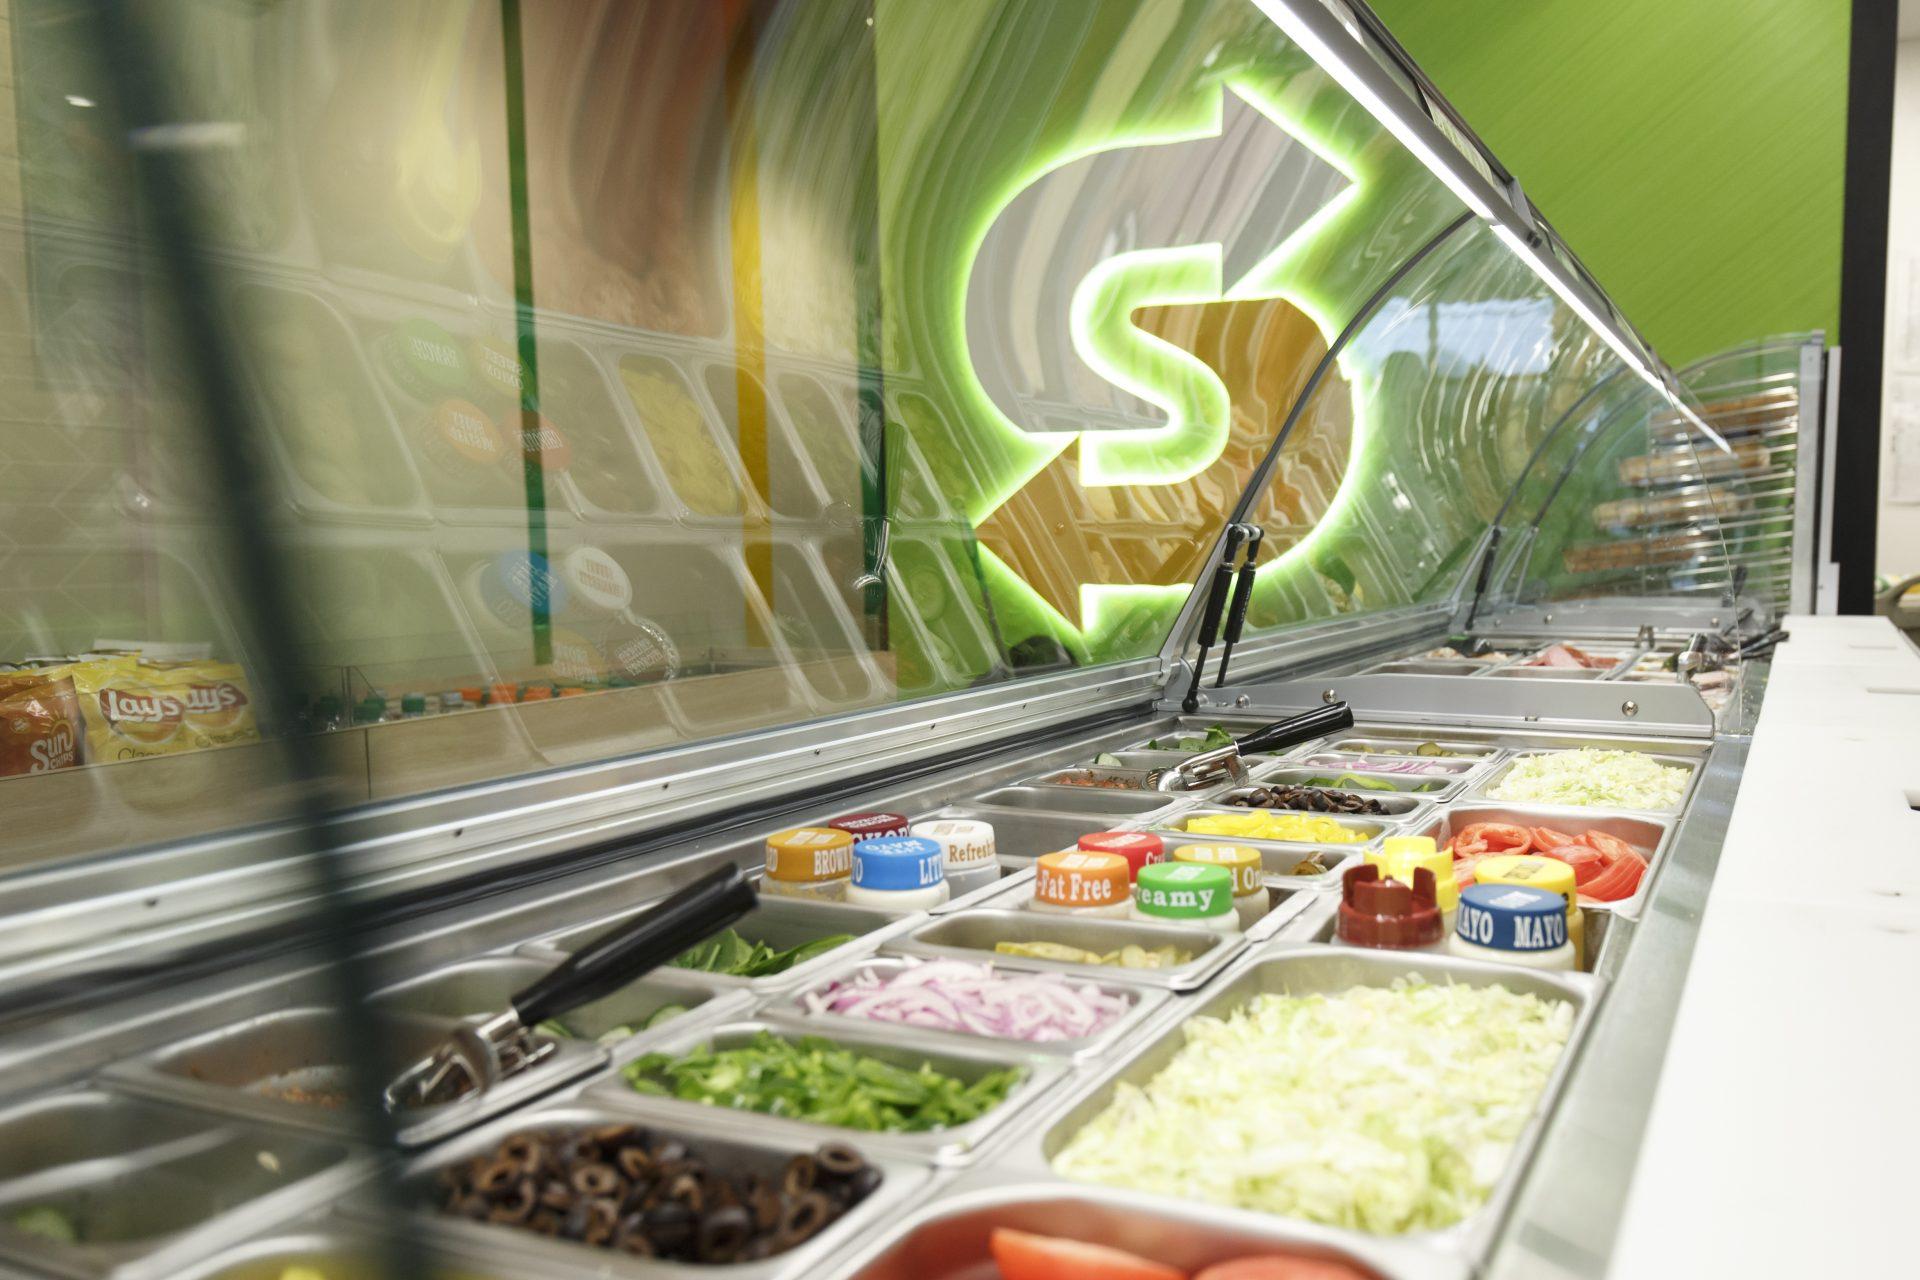 Niet-traditionele Subway restaurants als groeisegment